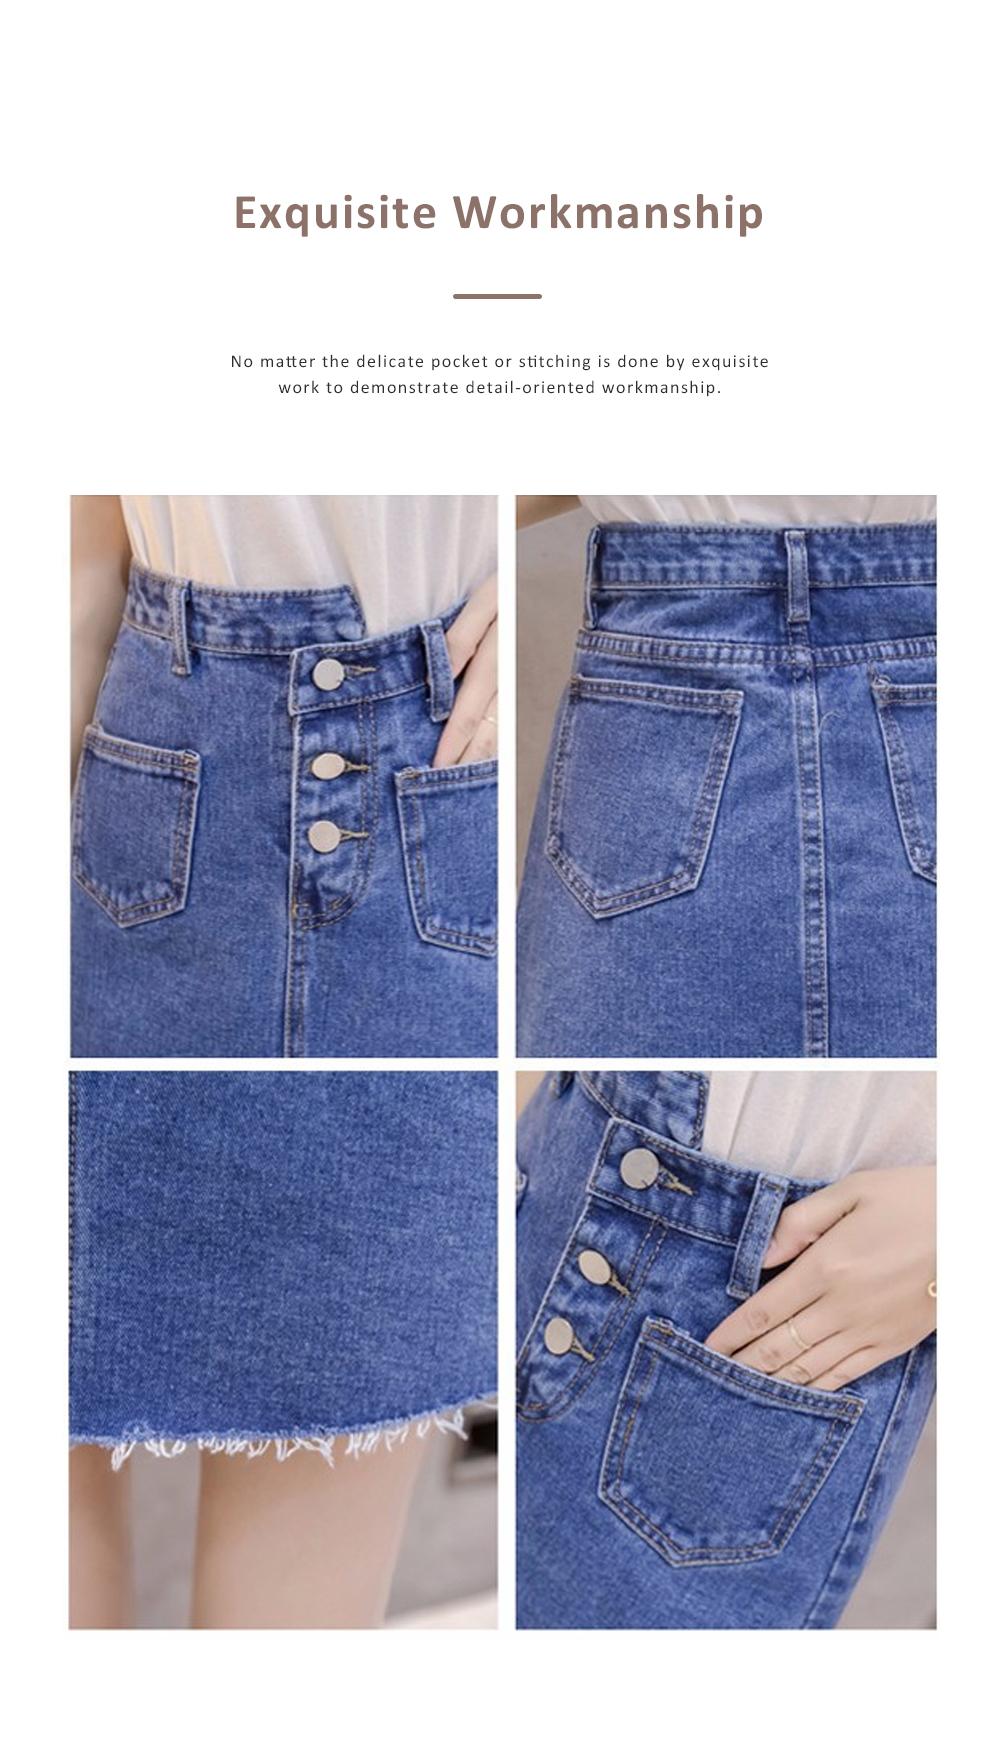 Close-fitting Irregular Denim Skirt for Women in Summer High-waisted Slimmer-looking Sheath Dress Hairy Brim Jean Midskirt Women Dress 5